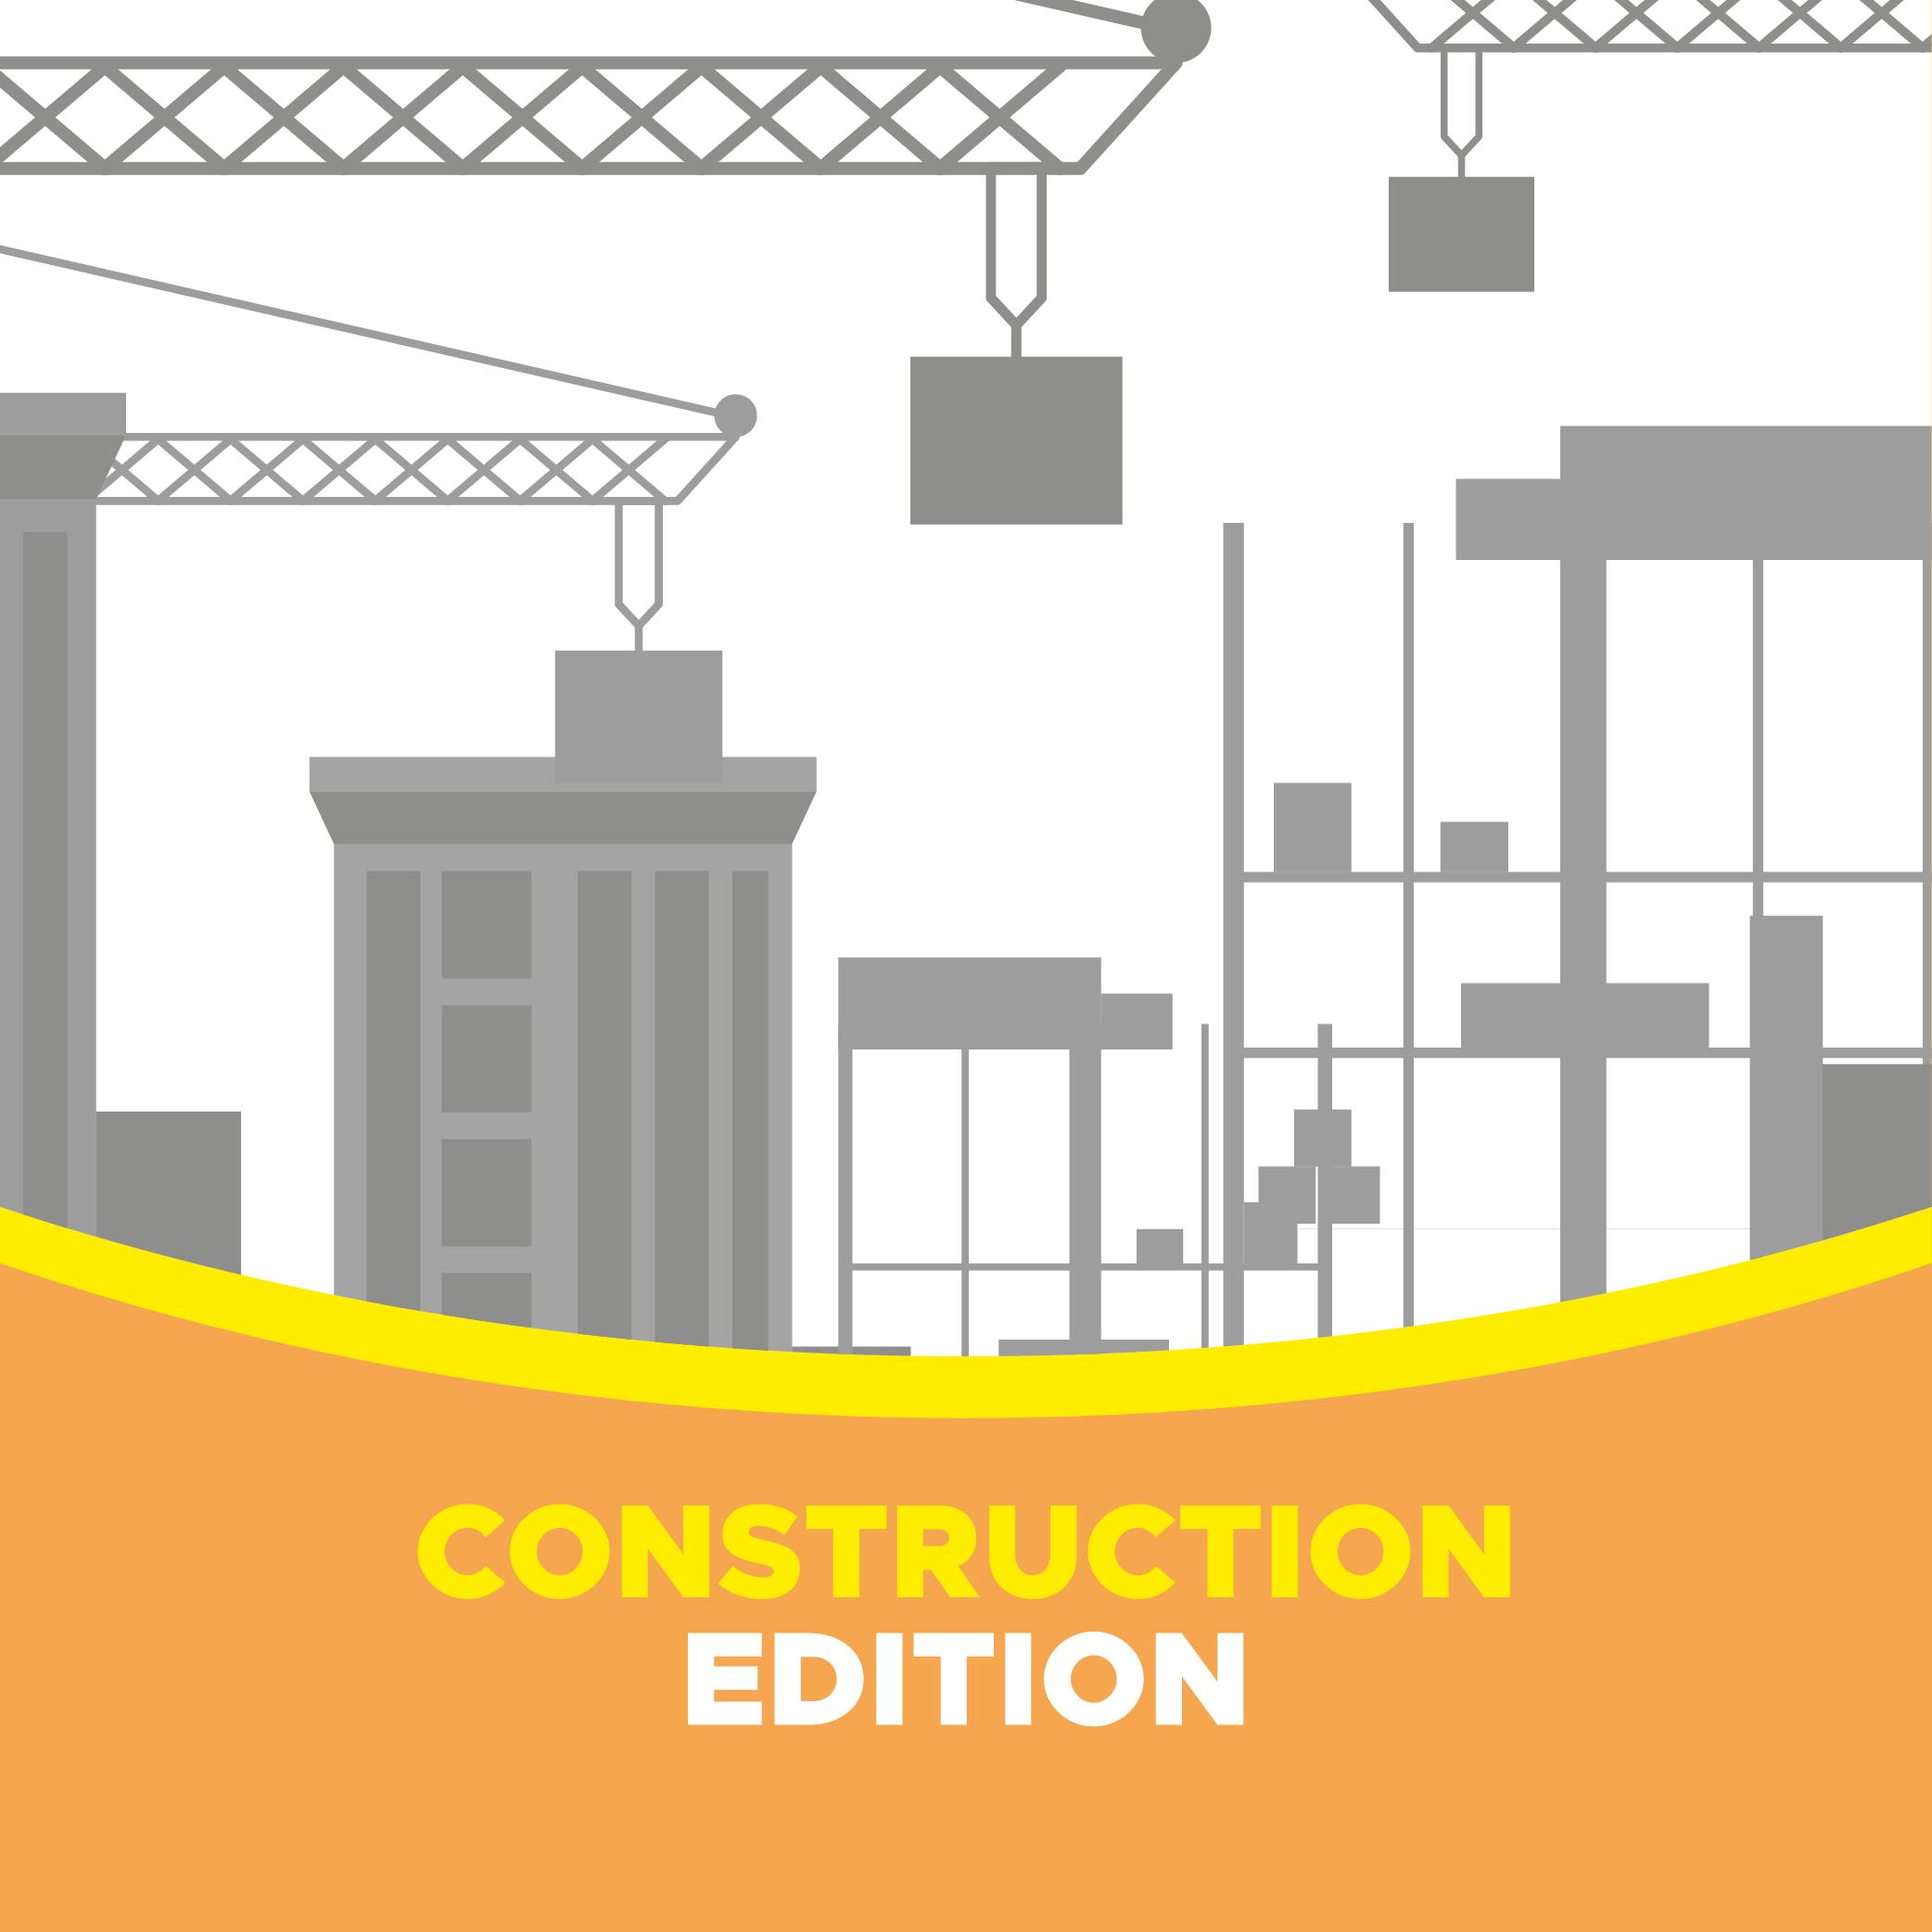 17.Construction Editon-01